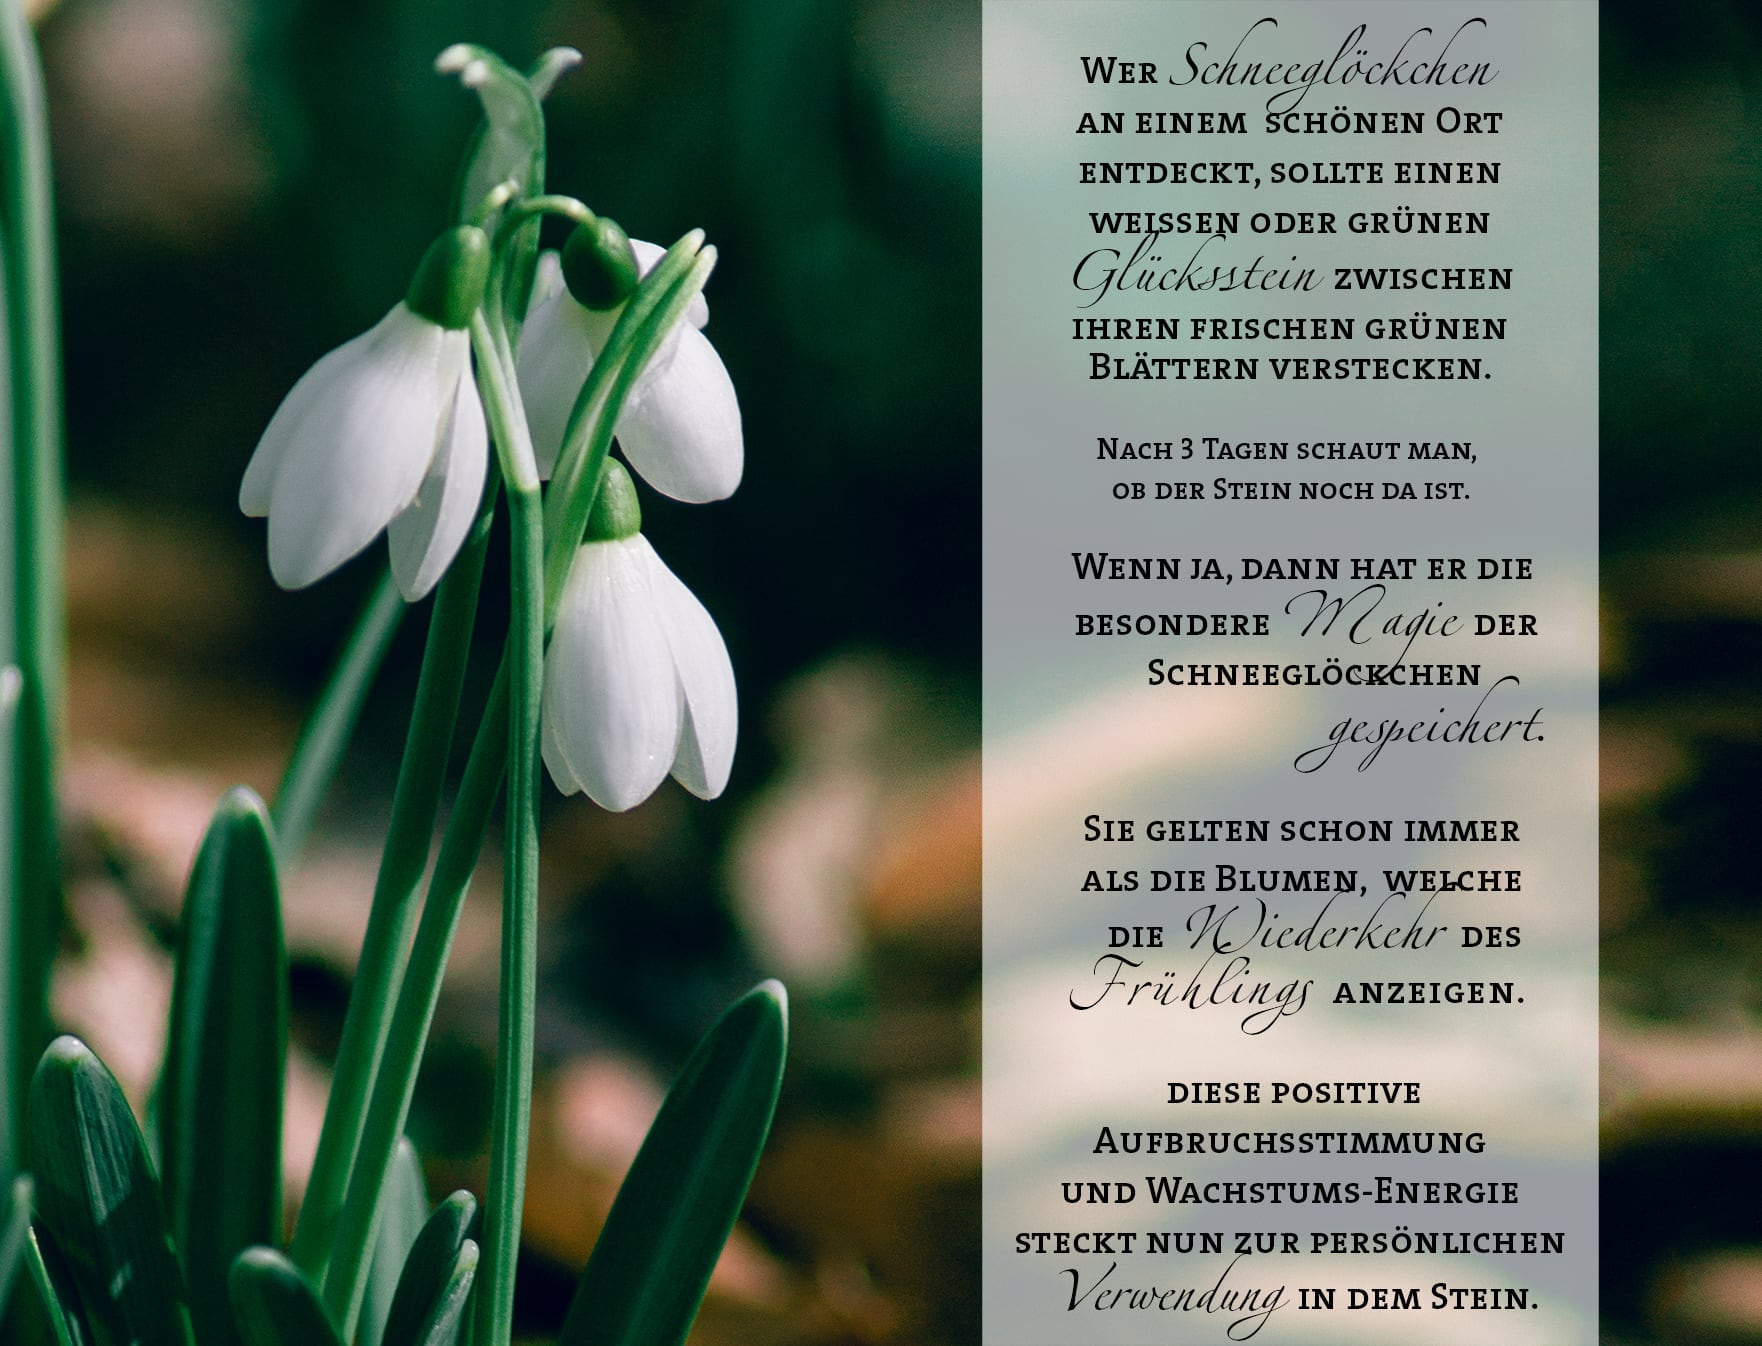 Großzügig Blumen Mit Lebensmittelfarbe Bilder - Druckbare ...